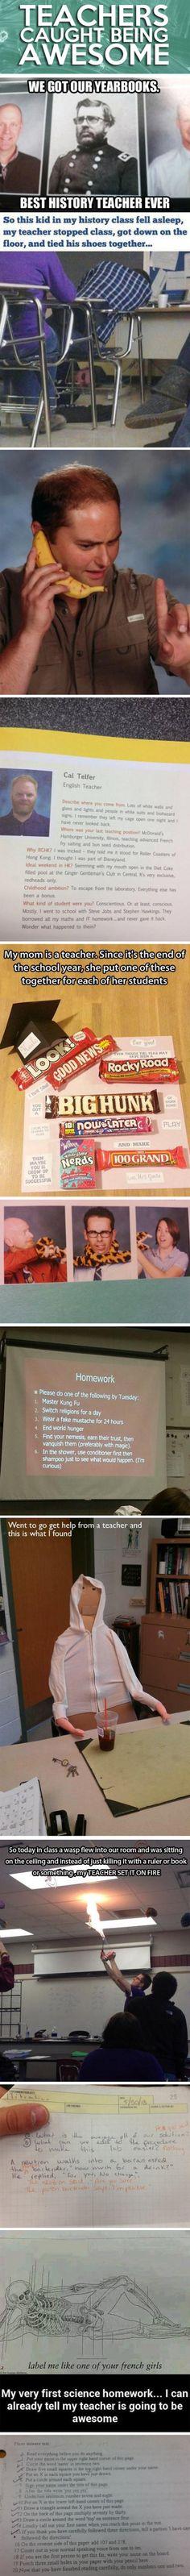 Teachers Caught Being Awesome | Tickld.com